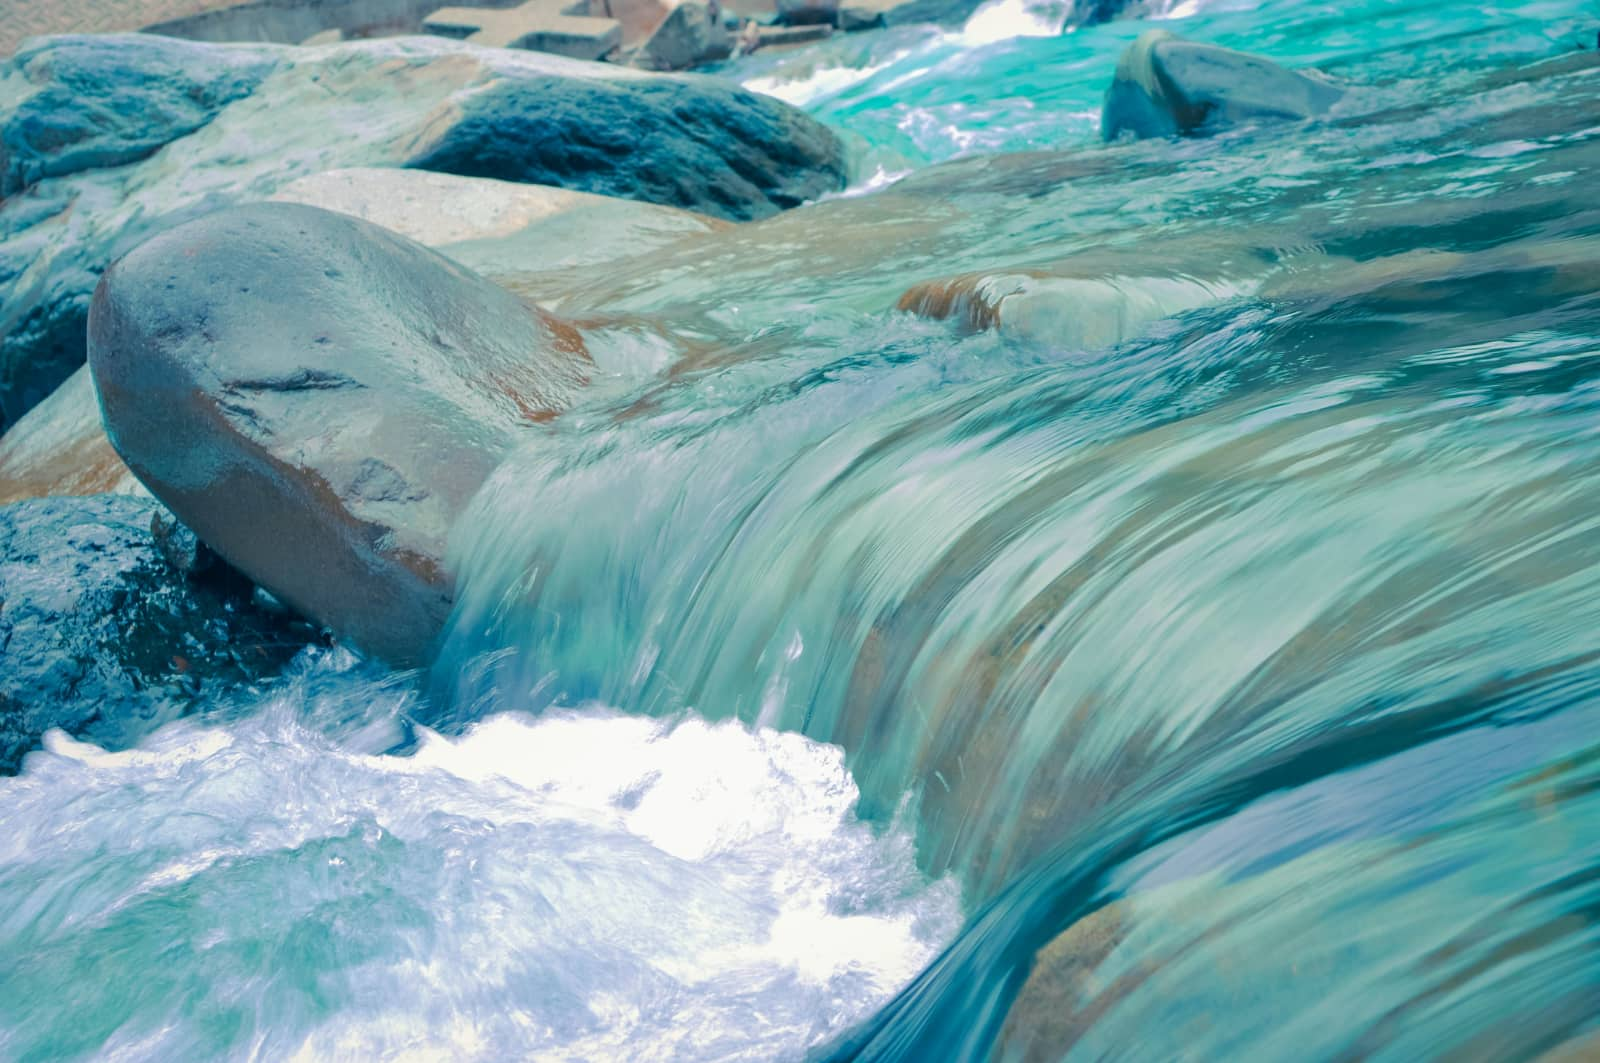 foto: leo rivas, zee met zeevonk